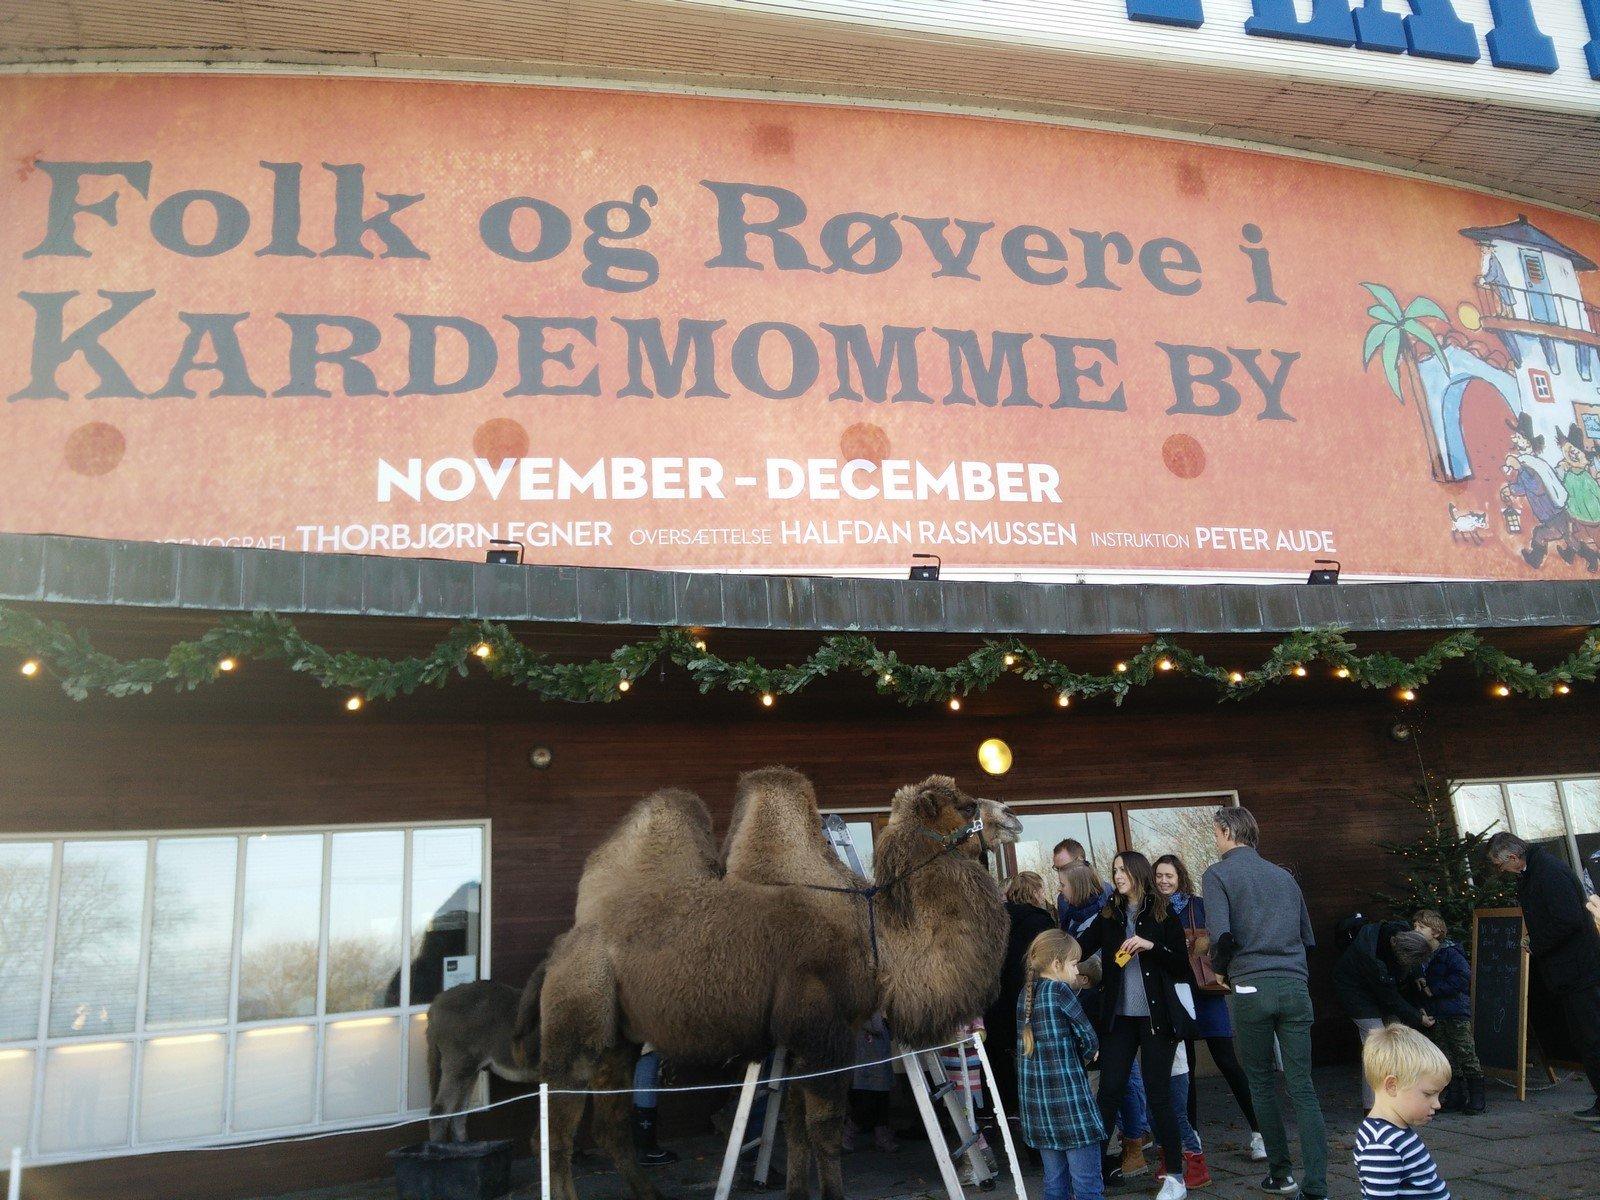 Foto: Christian Skovgaard Hansen